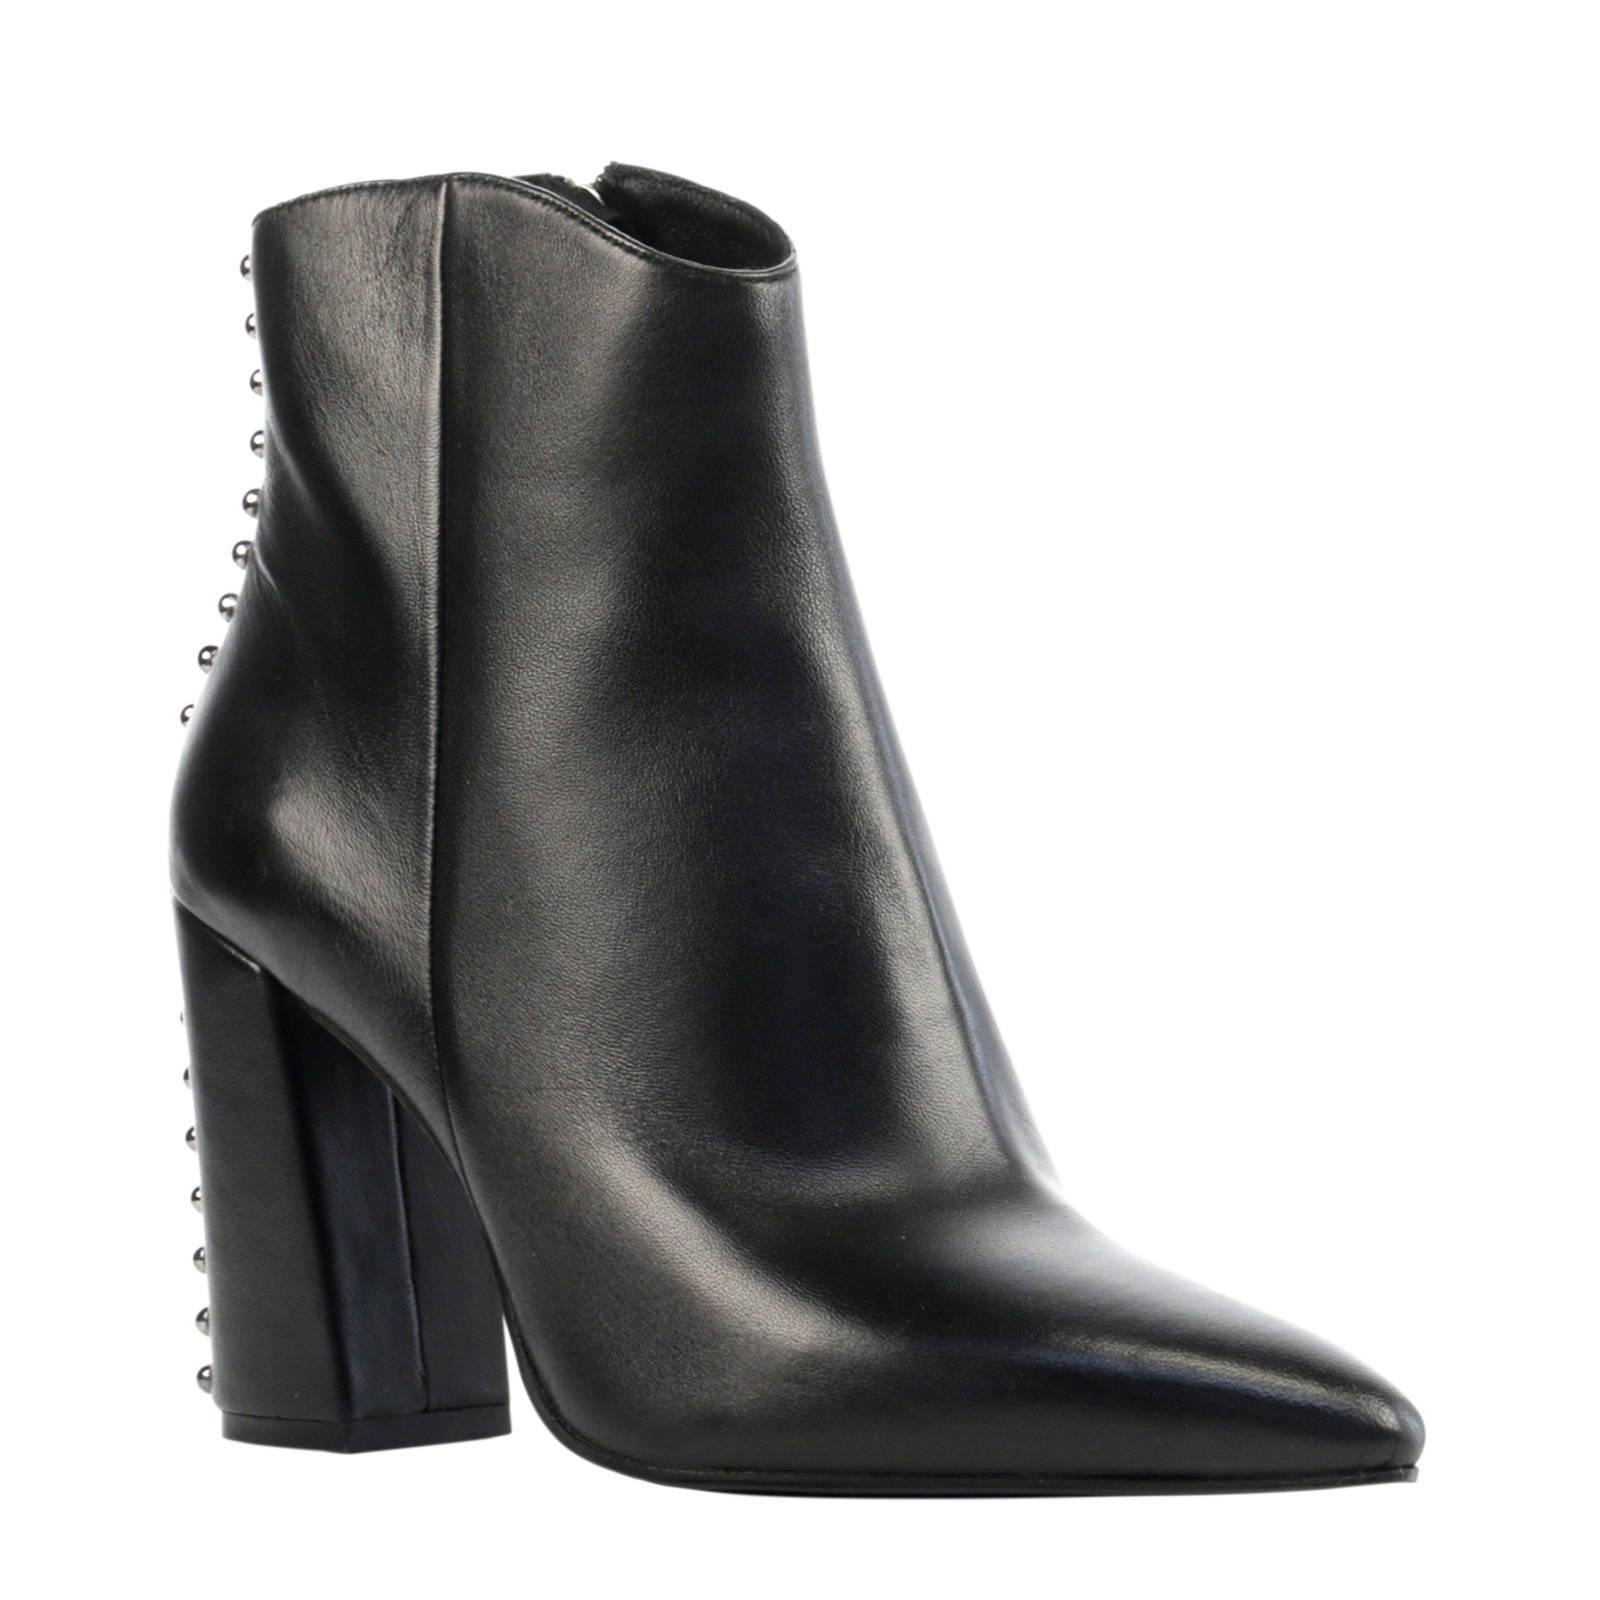 d3e4fab4356 Wannahaves - schoenen bij wehkamp - Gratis bezorging vanaf 20.-